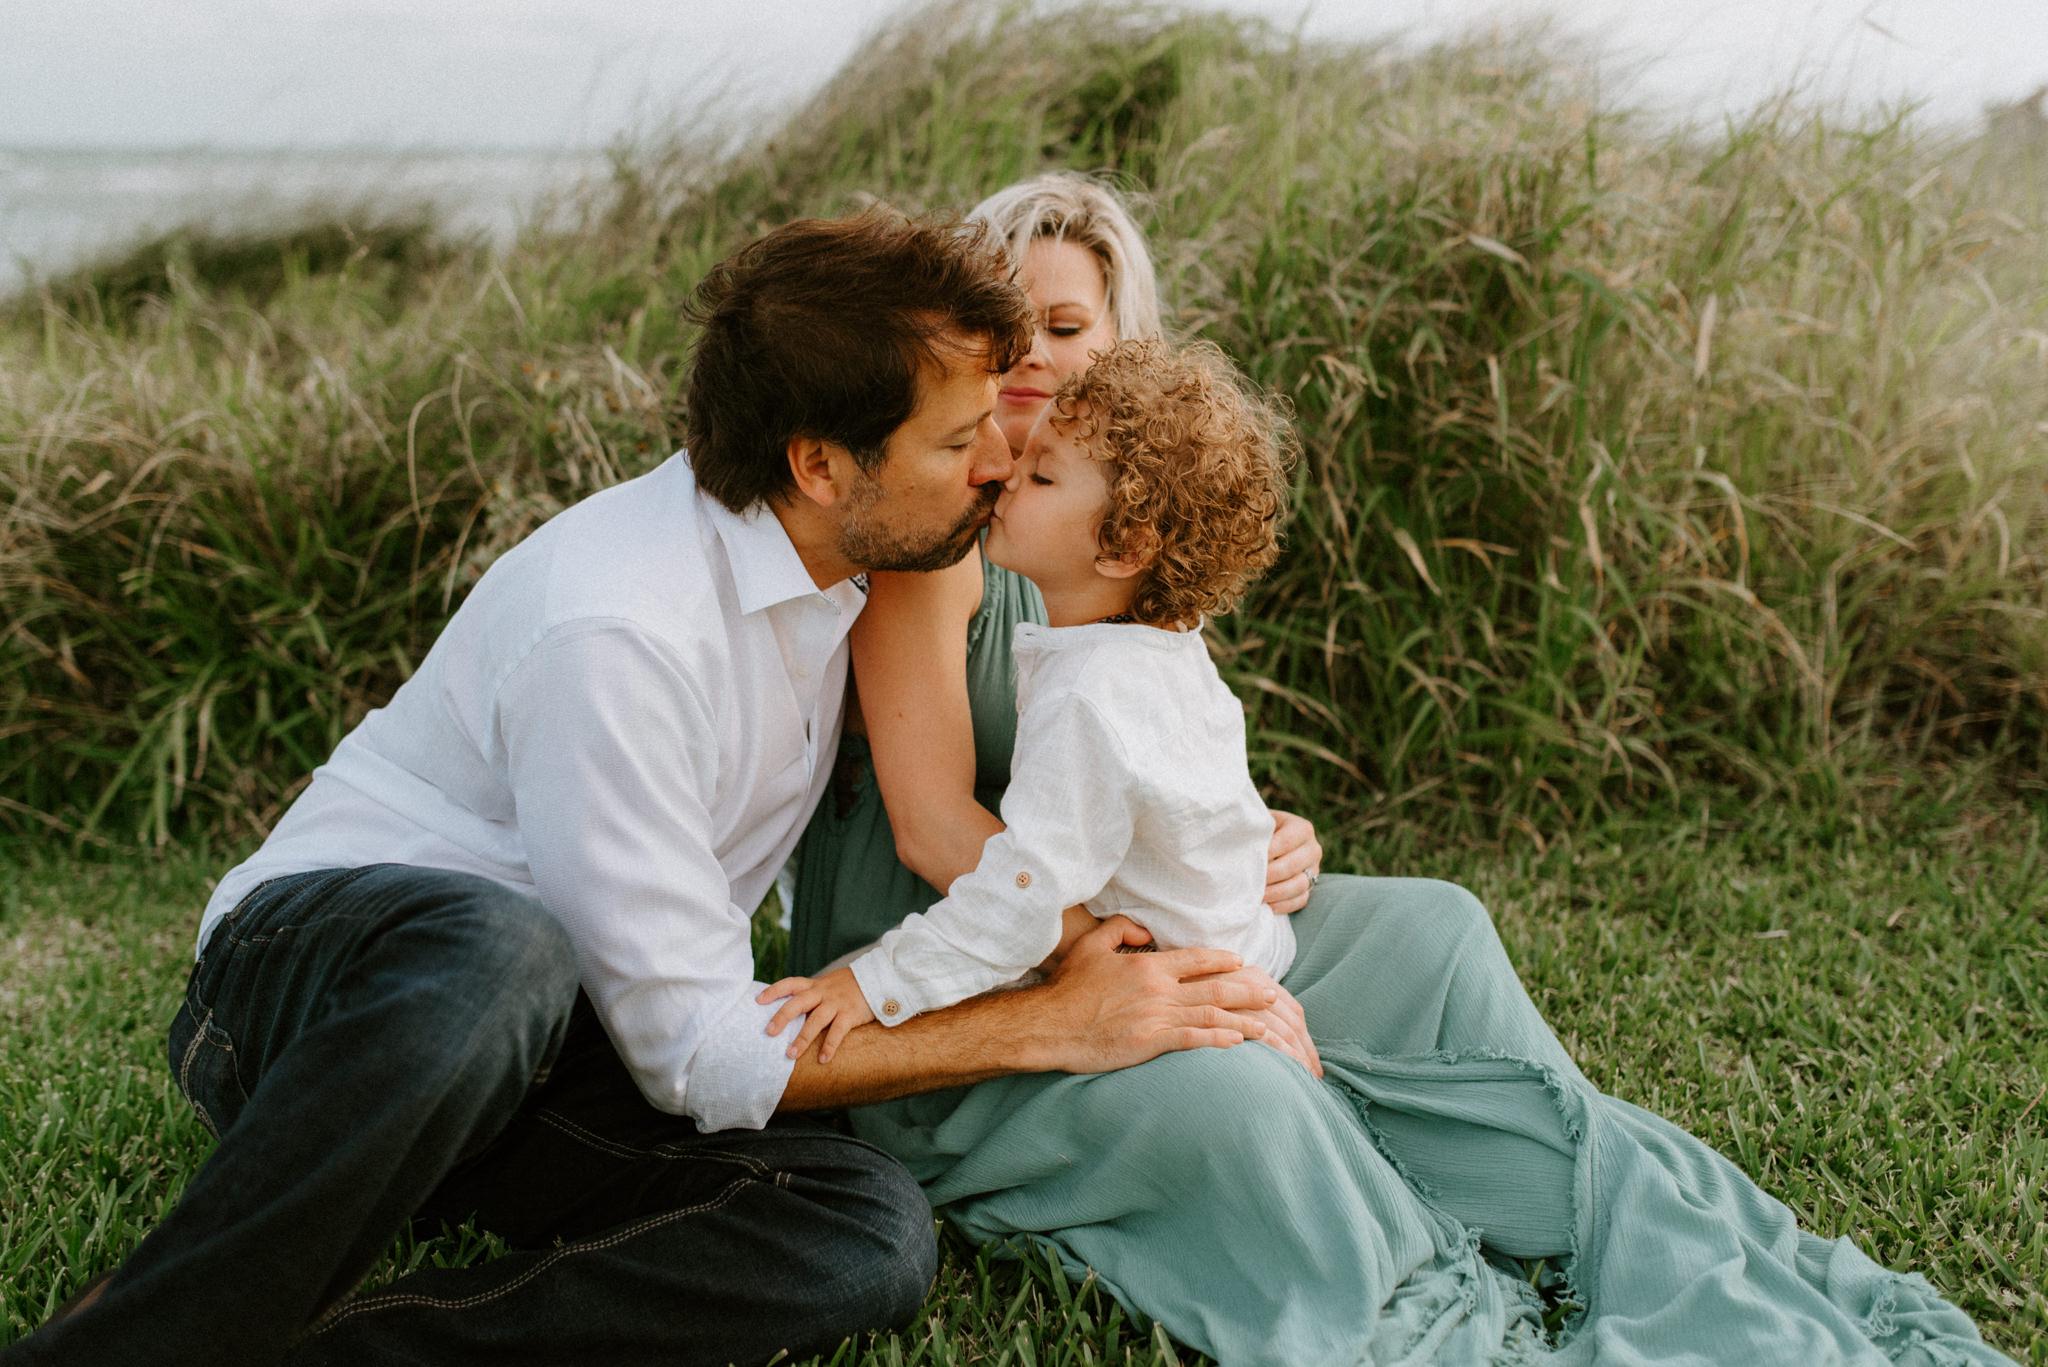 Corpus-Christi-Family-Photographer-Kerlyn-Van-Gelder-Photography23.jpg